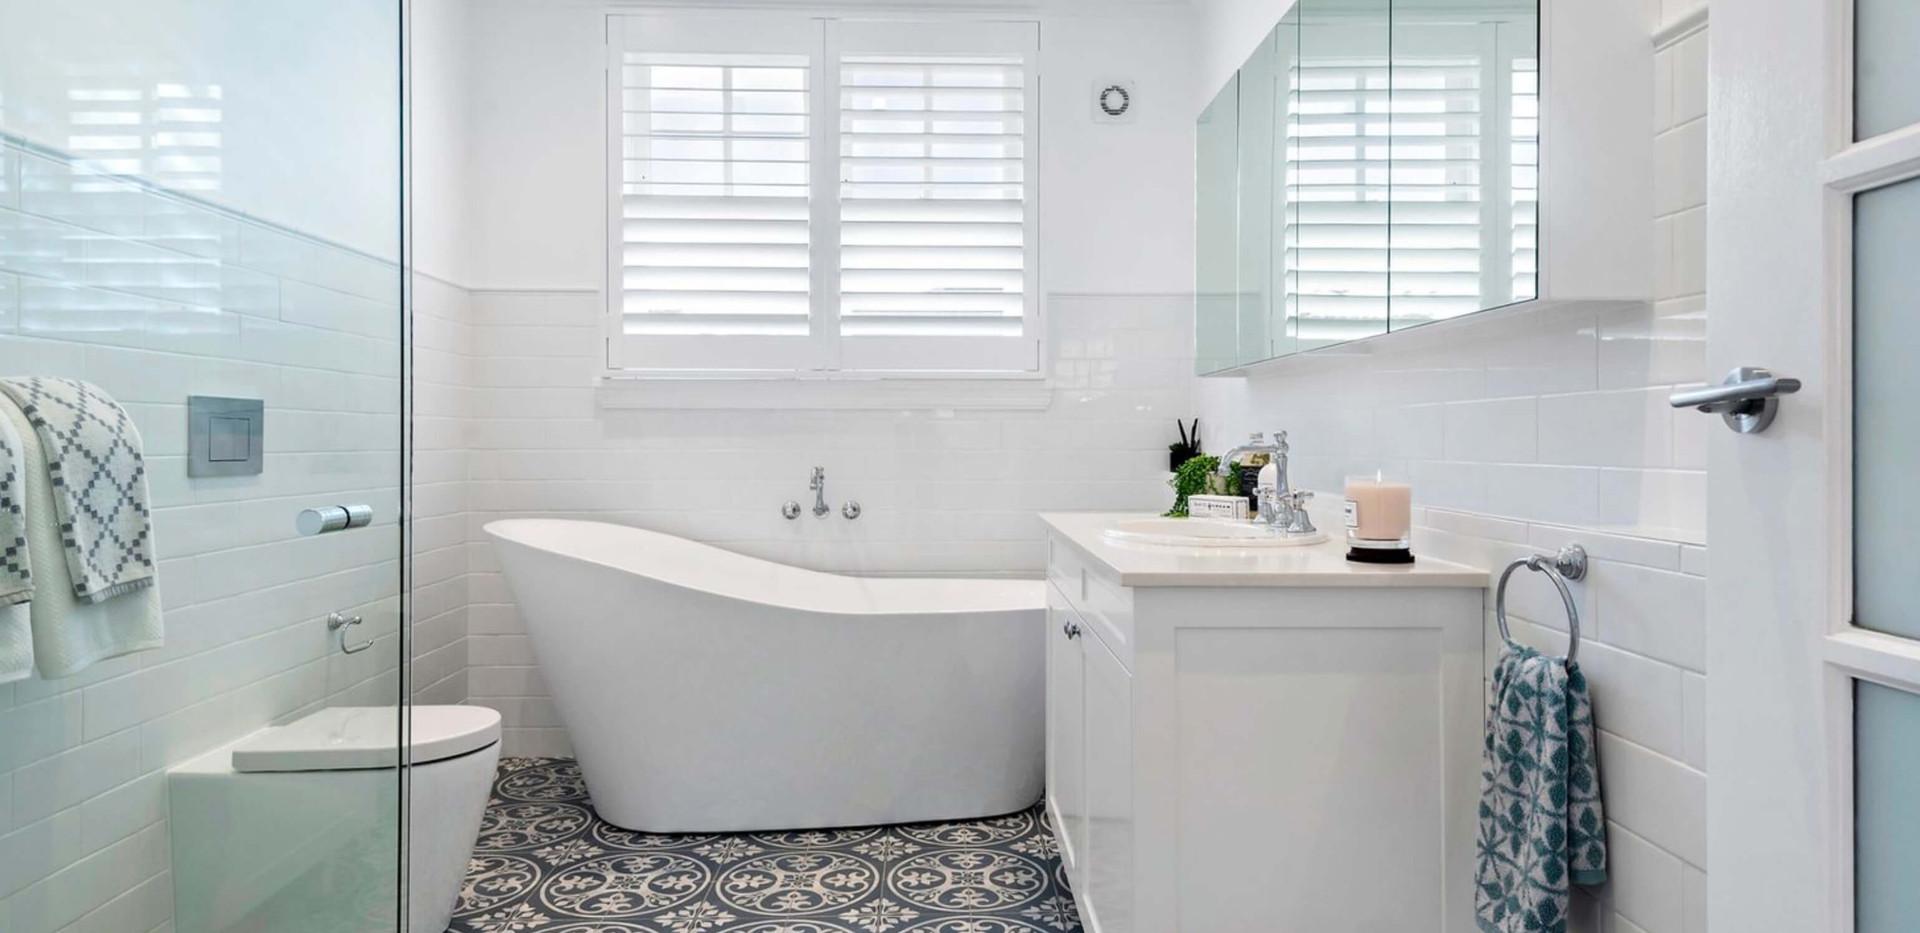 Seaforth Hamptons House - Residential bathroom interior design